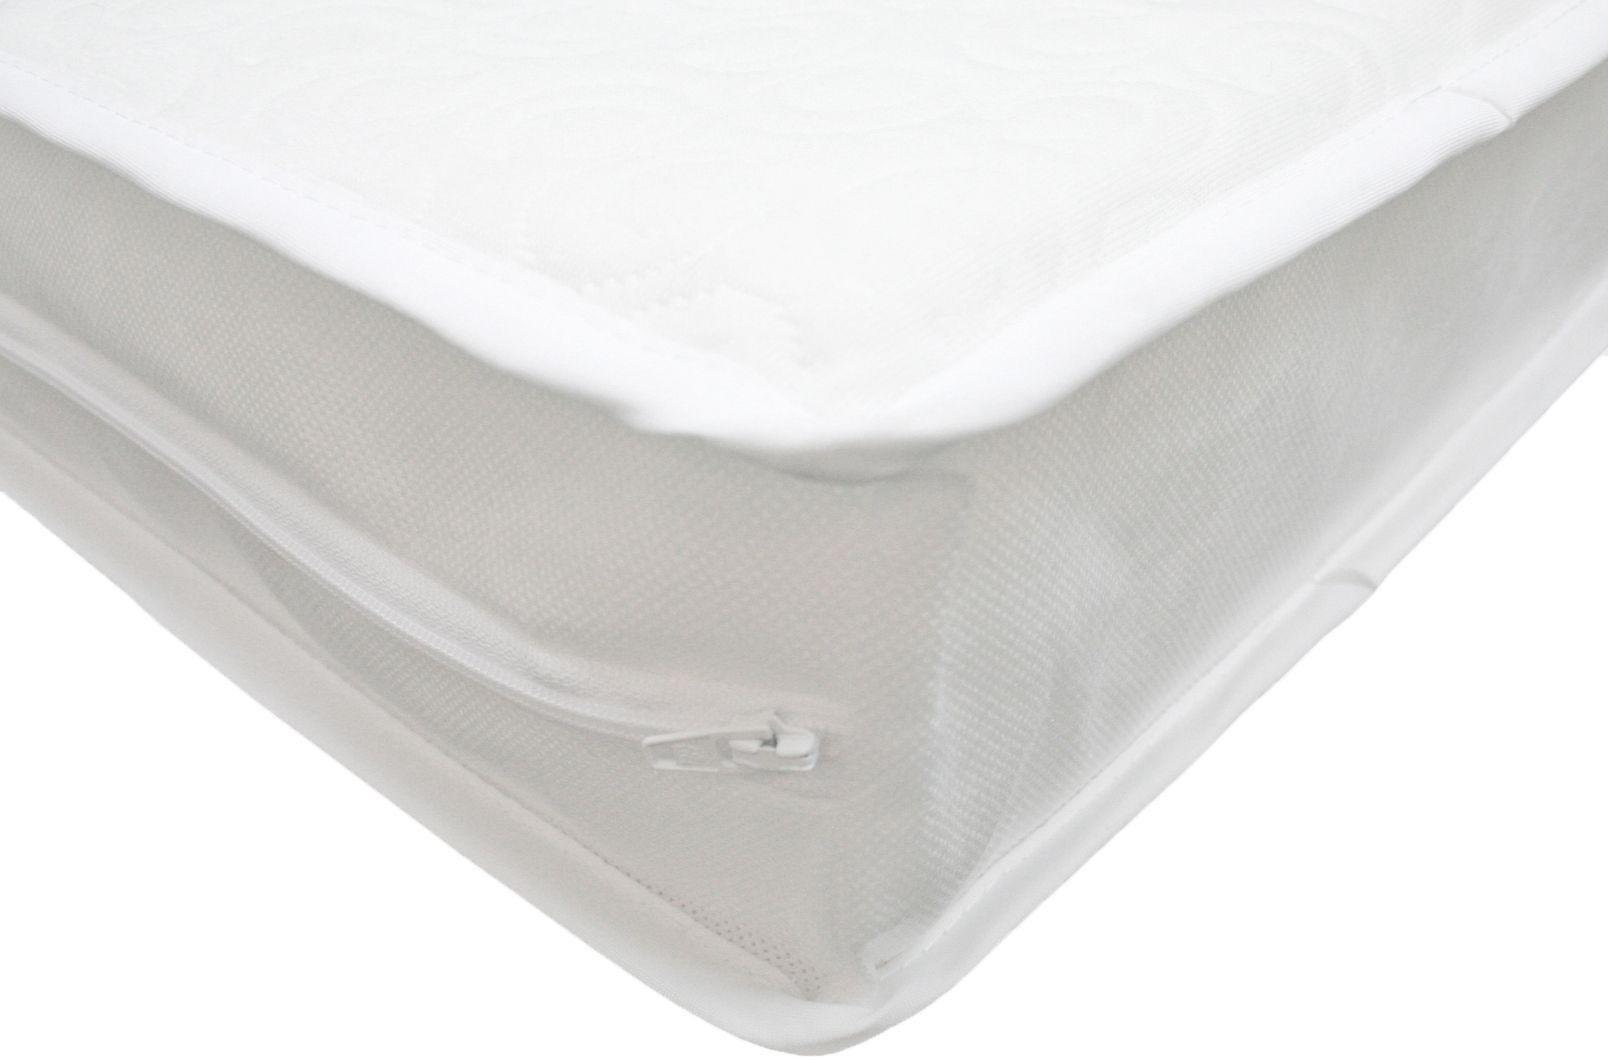 kub complete mattress  70 x 140cm.